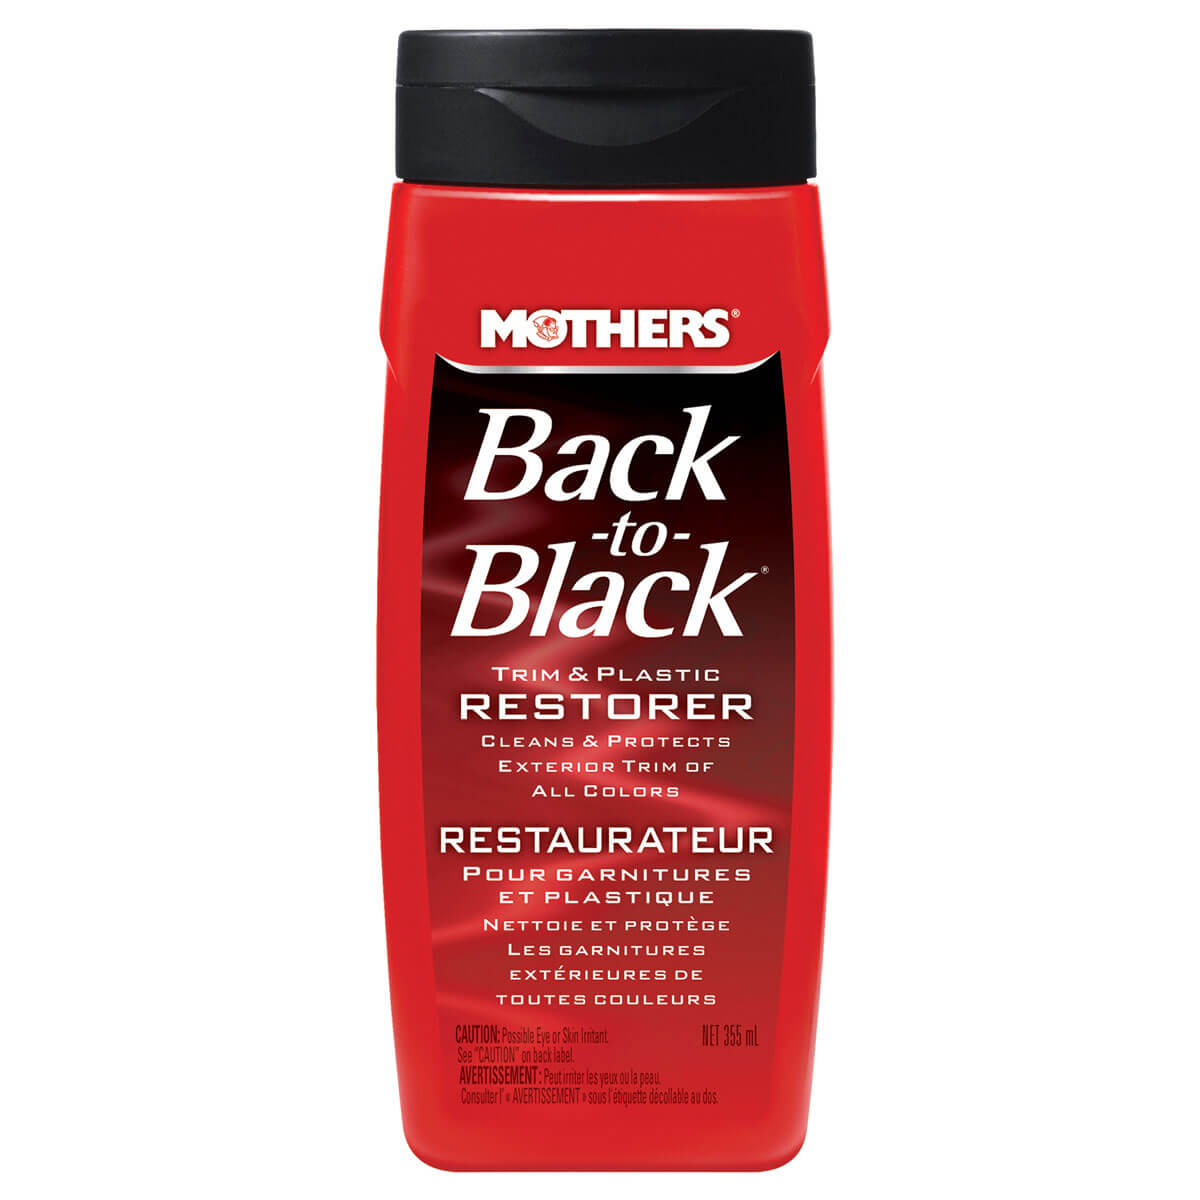 Back-To-Black Trim & Plastic Restorer - 12oz